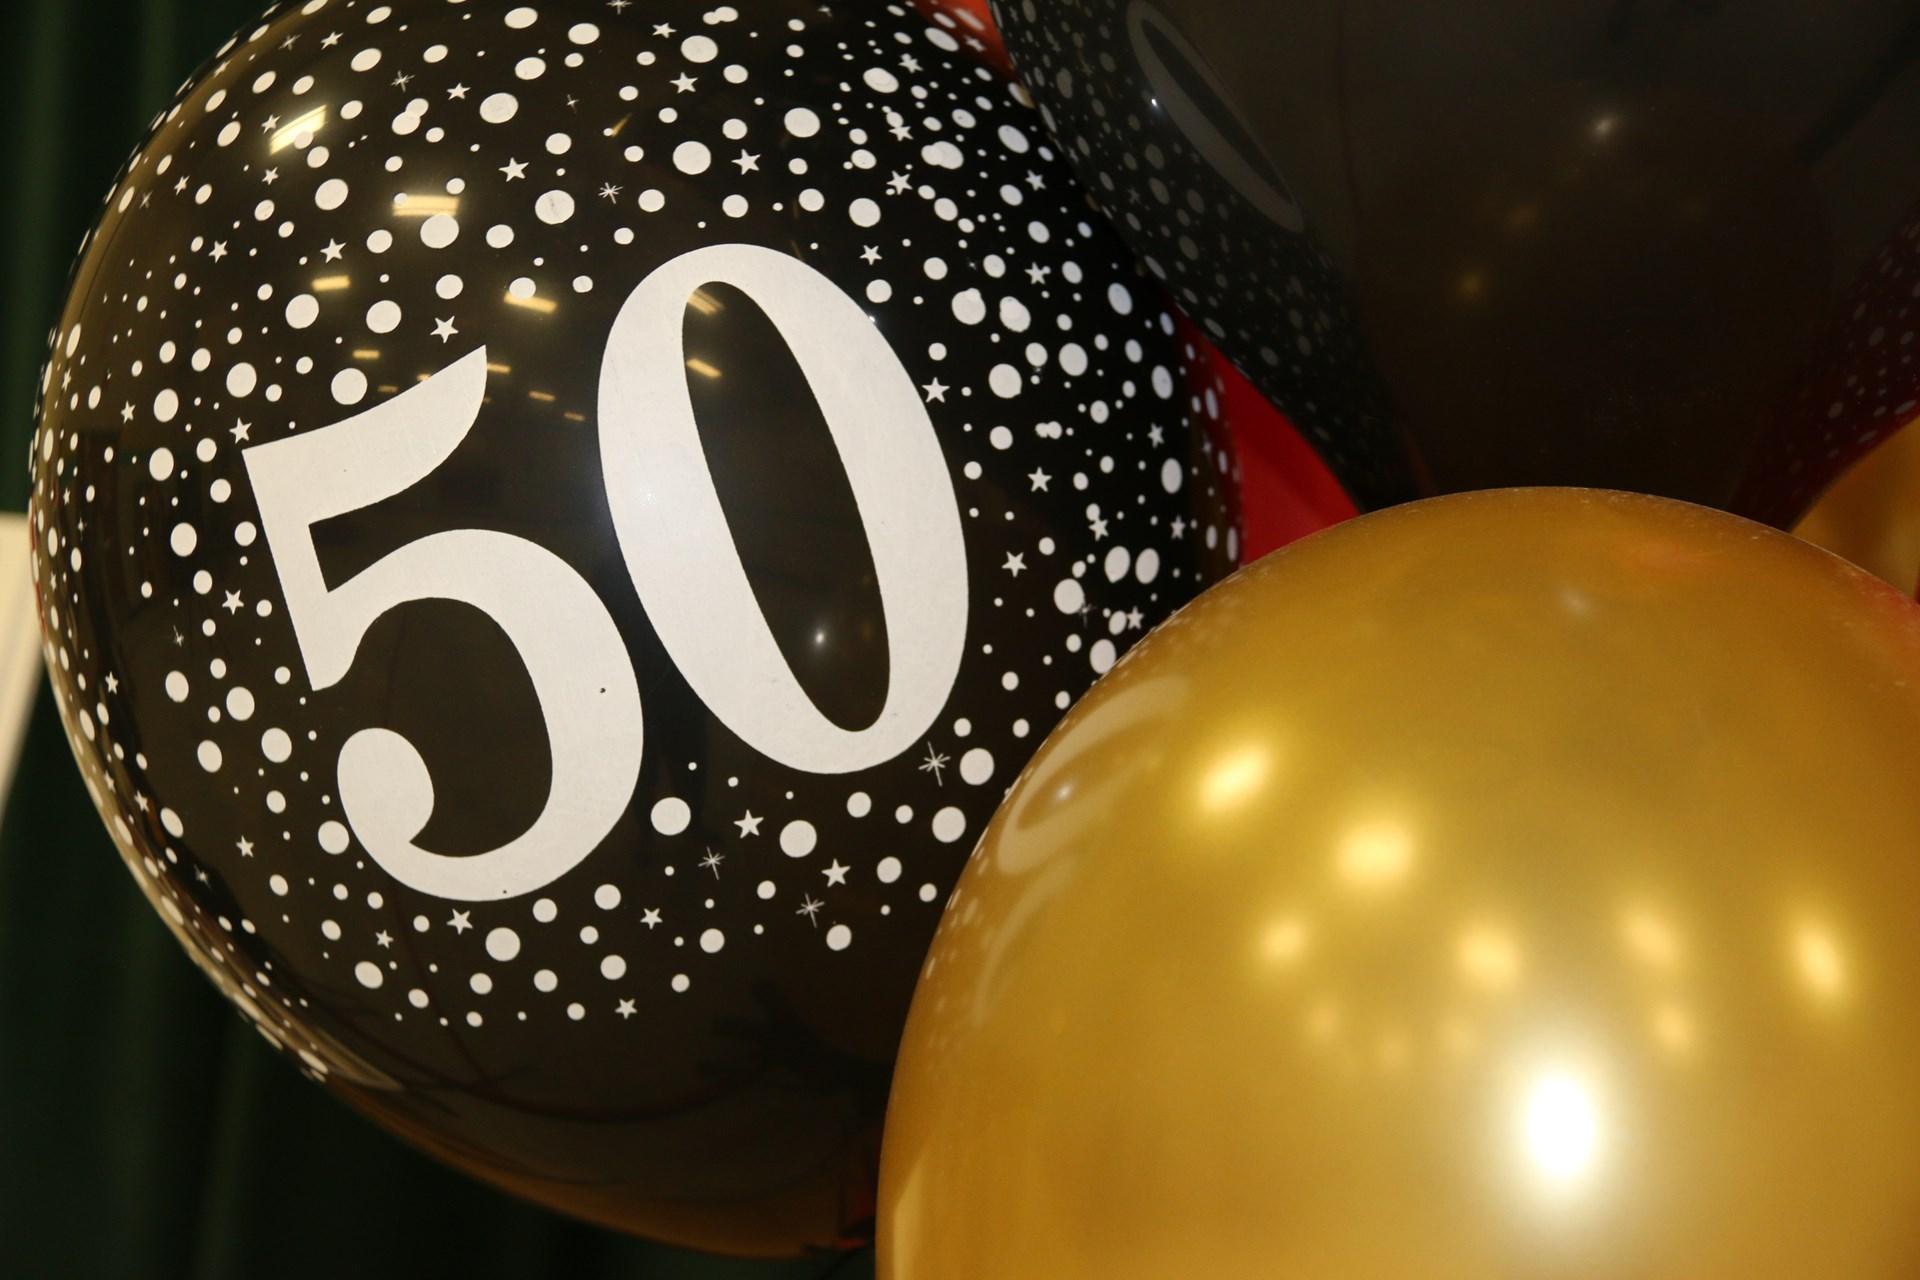 50 years balloons